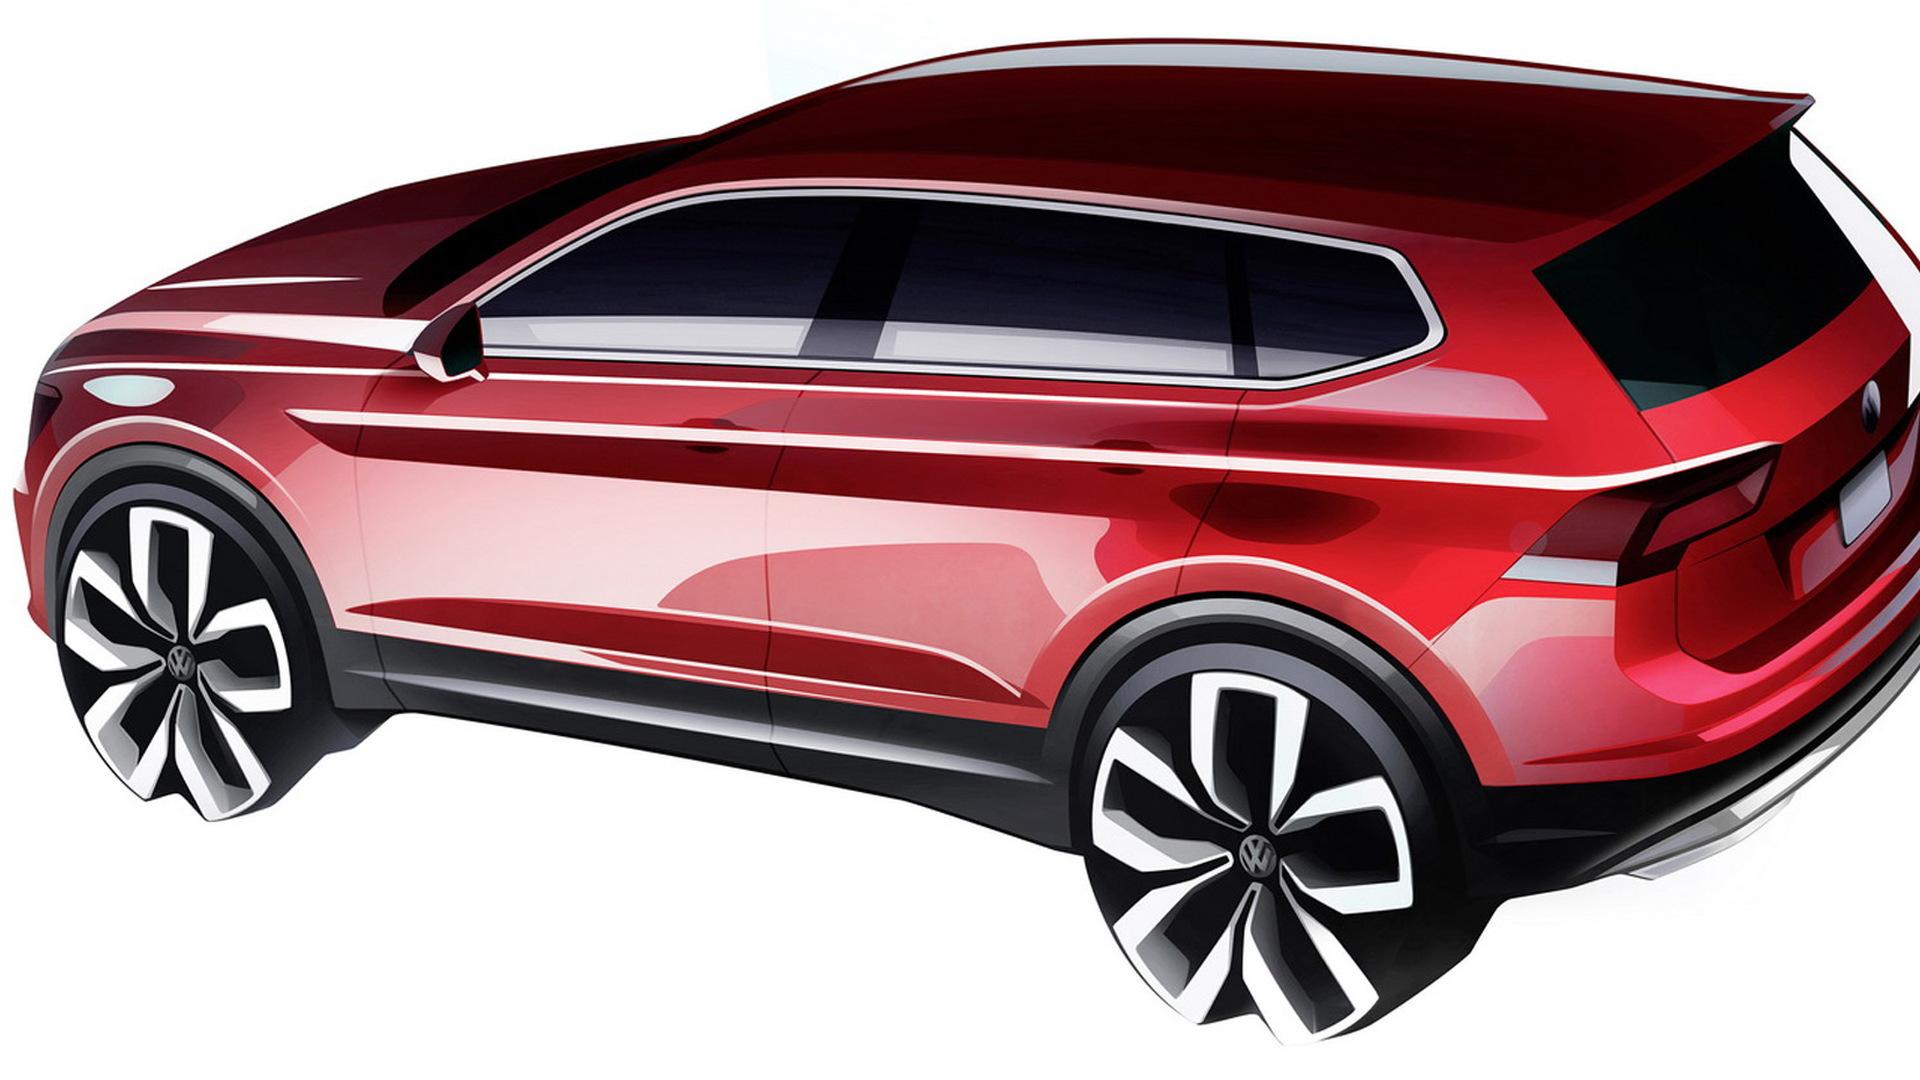 2018 Volkswagen Tiguan Alle Teased Ahead Of 2017 Detroit Auto Show